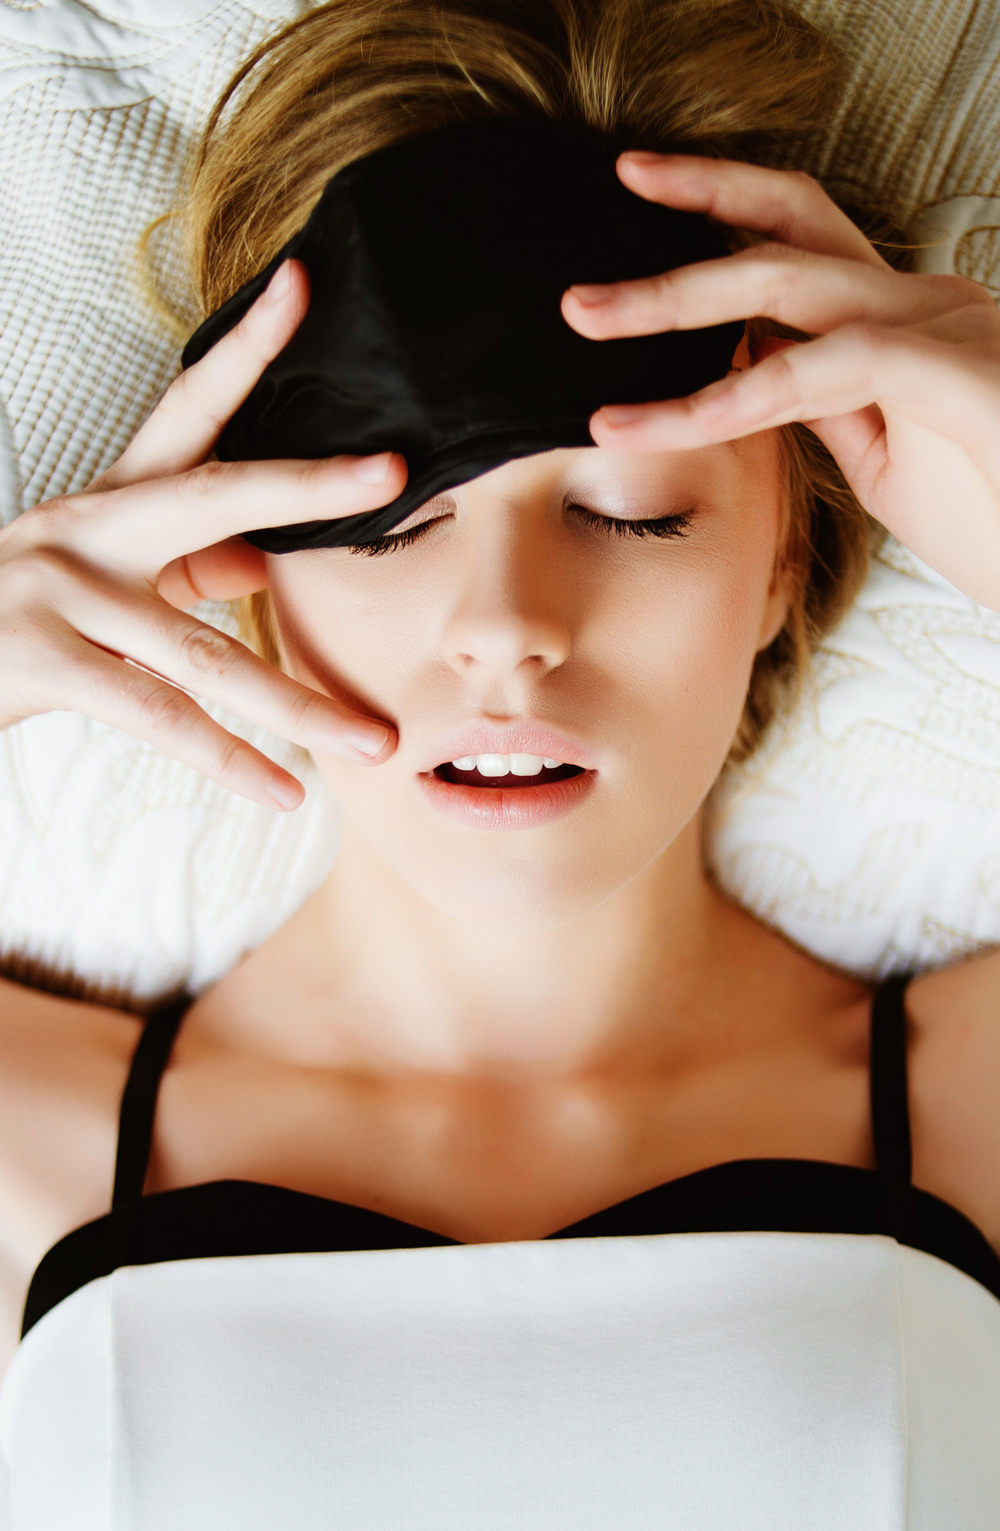 Nutrition & lifestyle tips for getting good night sleep via www.fashionedbylove.co.uk british fashion blog